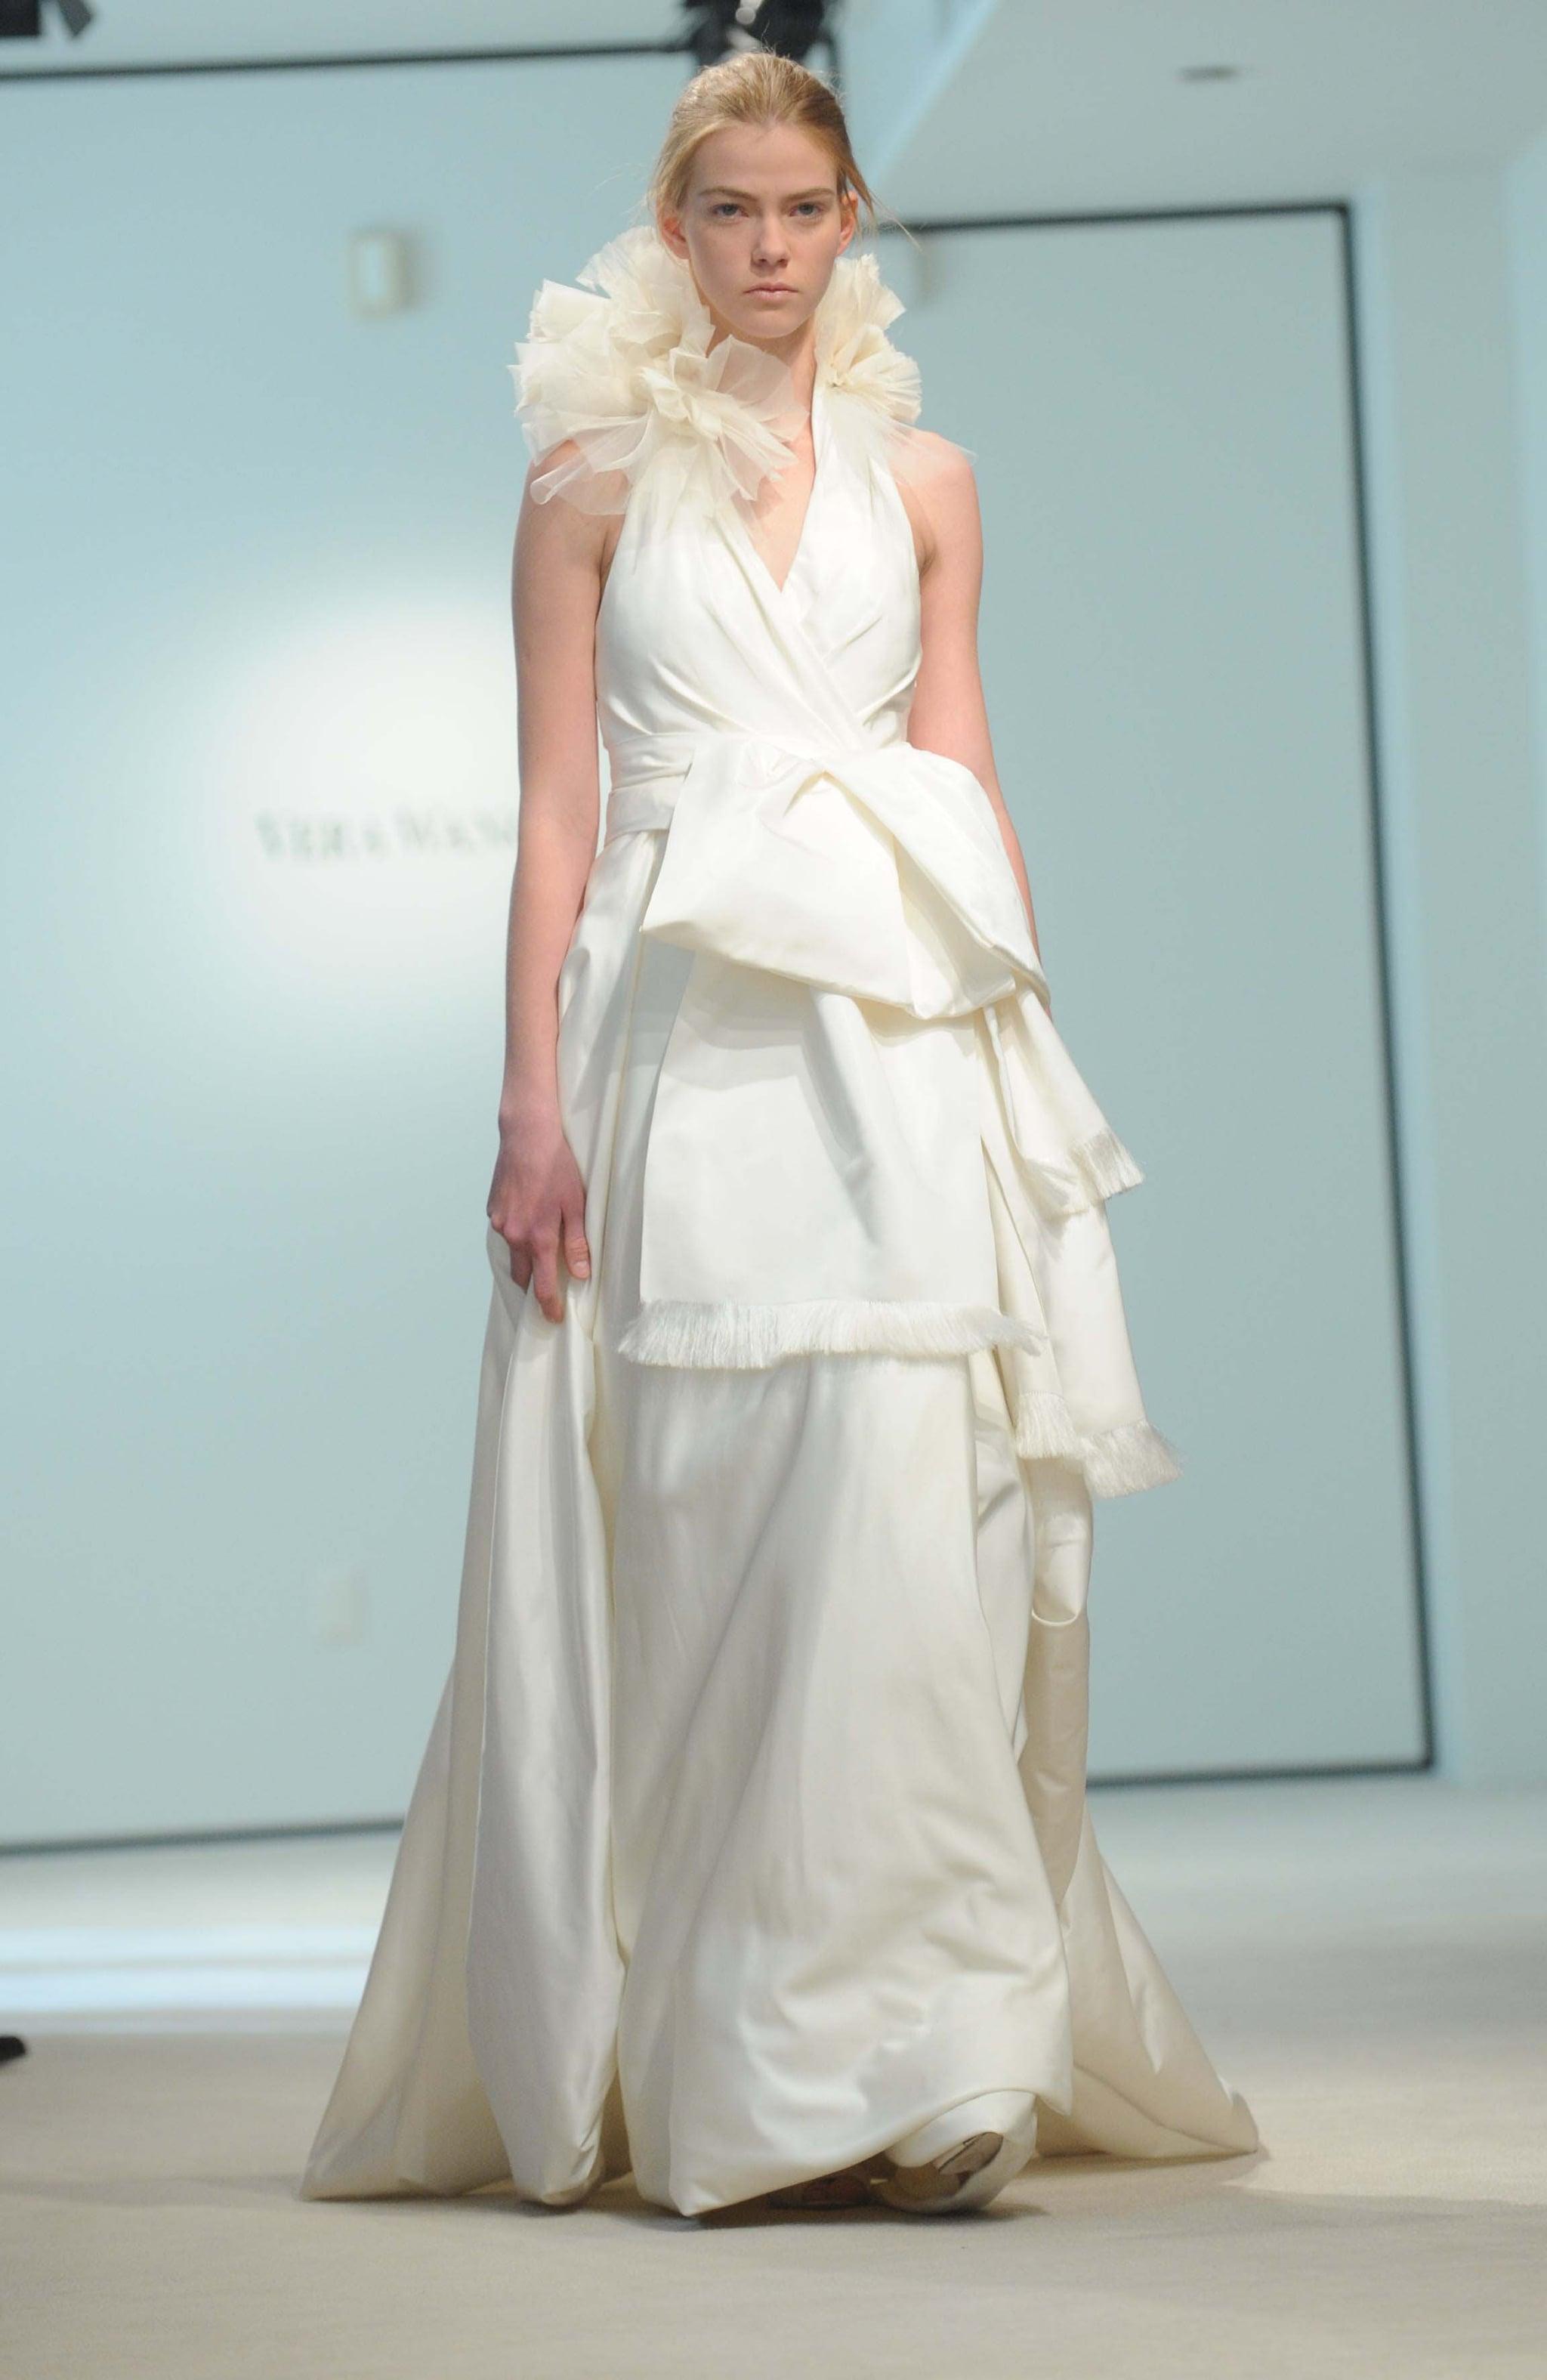 Luxury Short Vera Wang Wedding Dresses Pictures - All Wedding ...